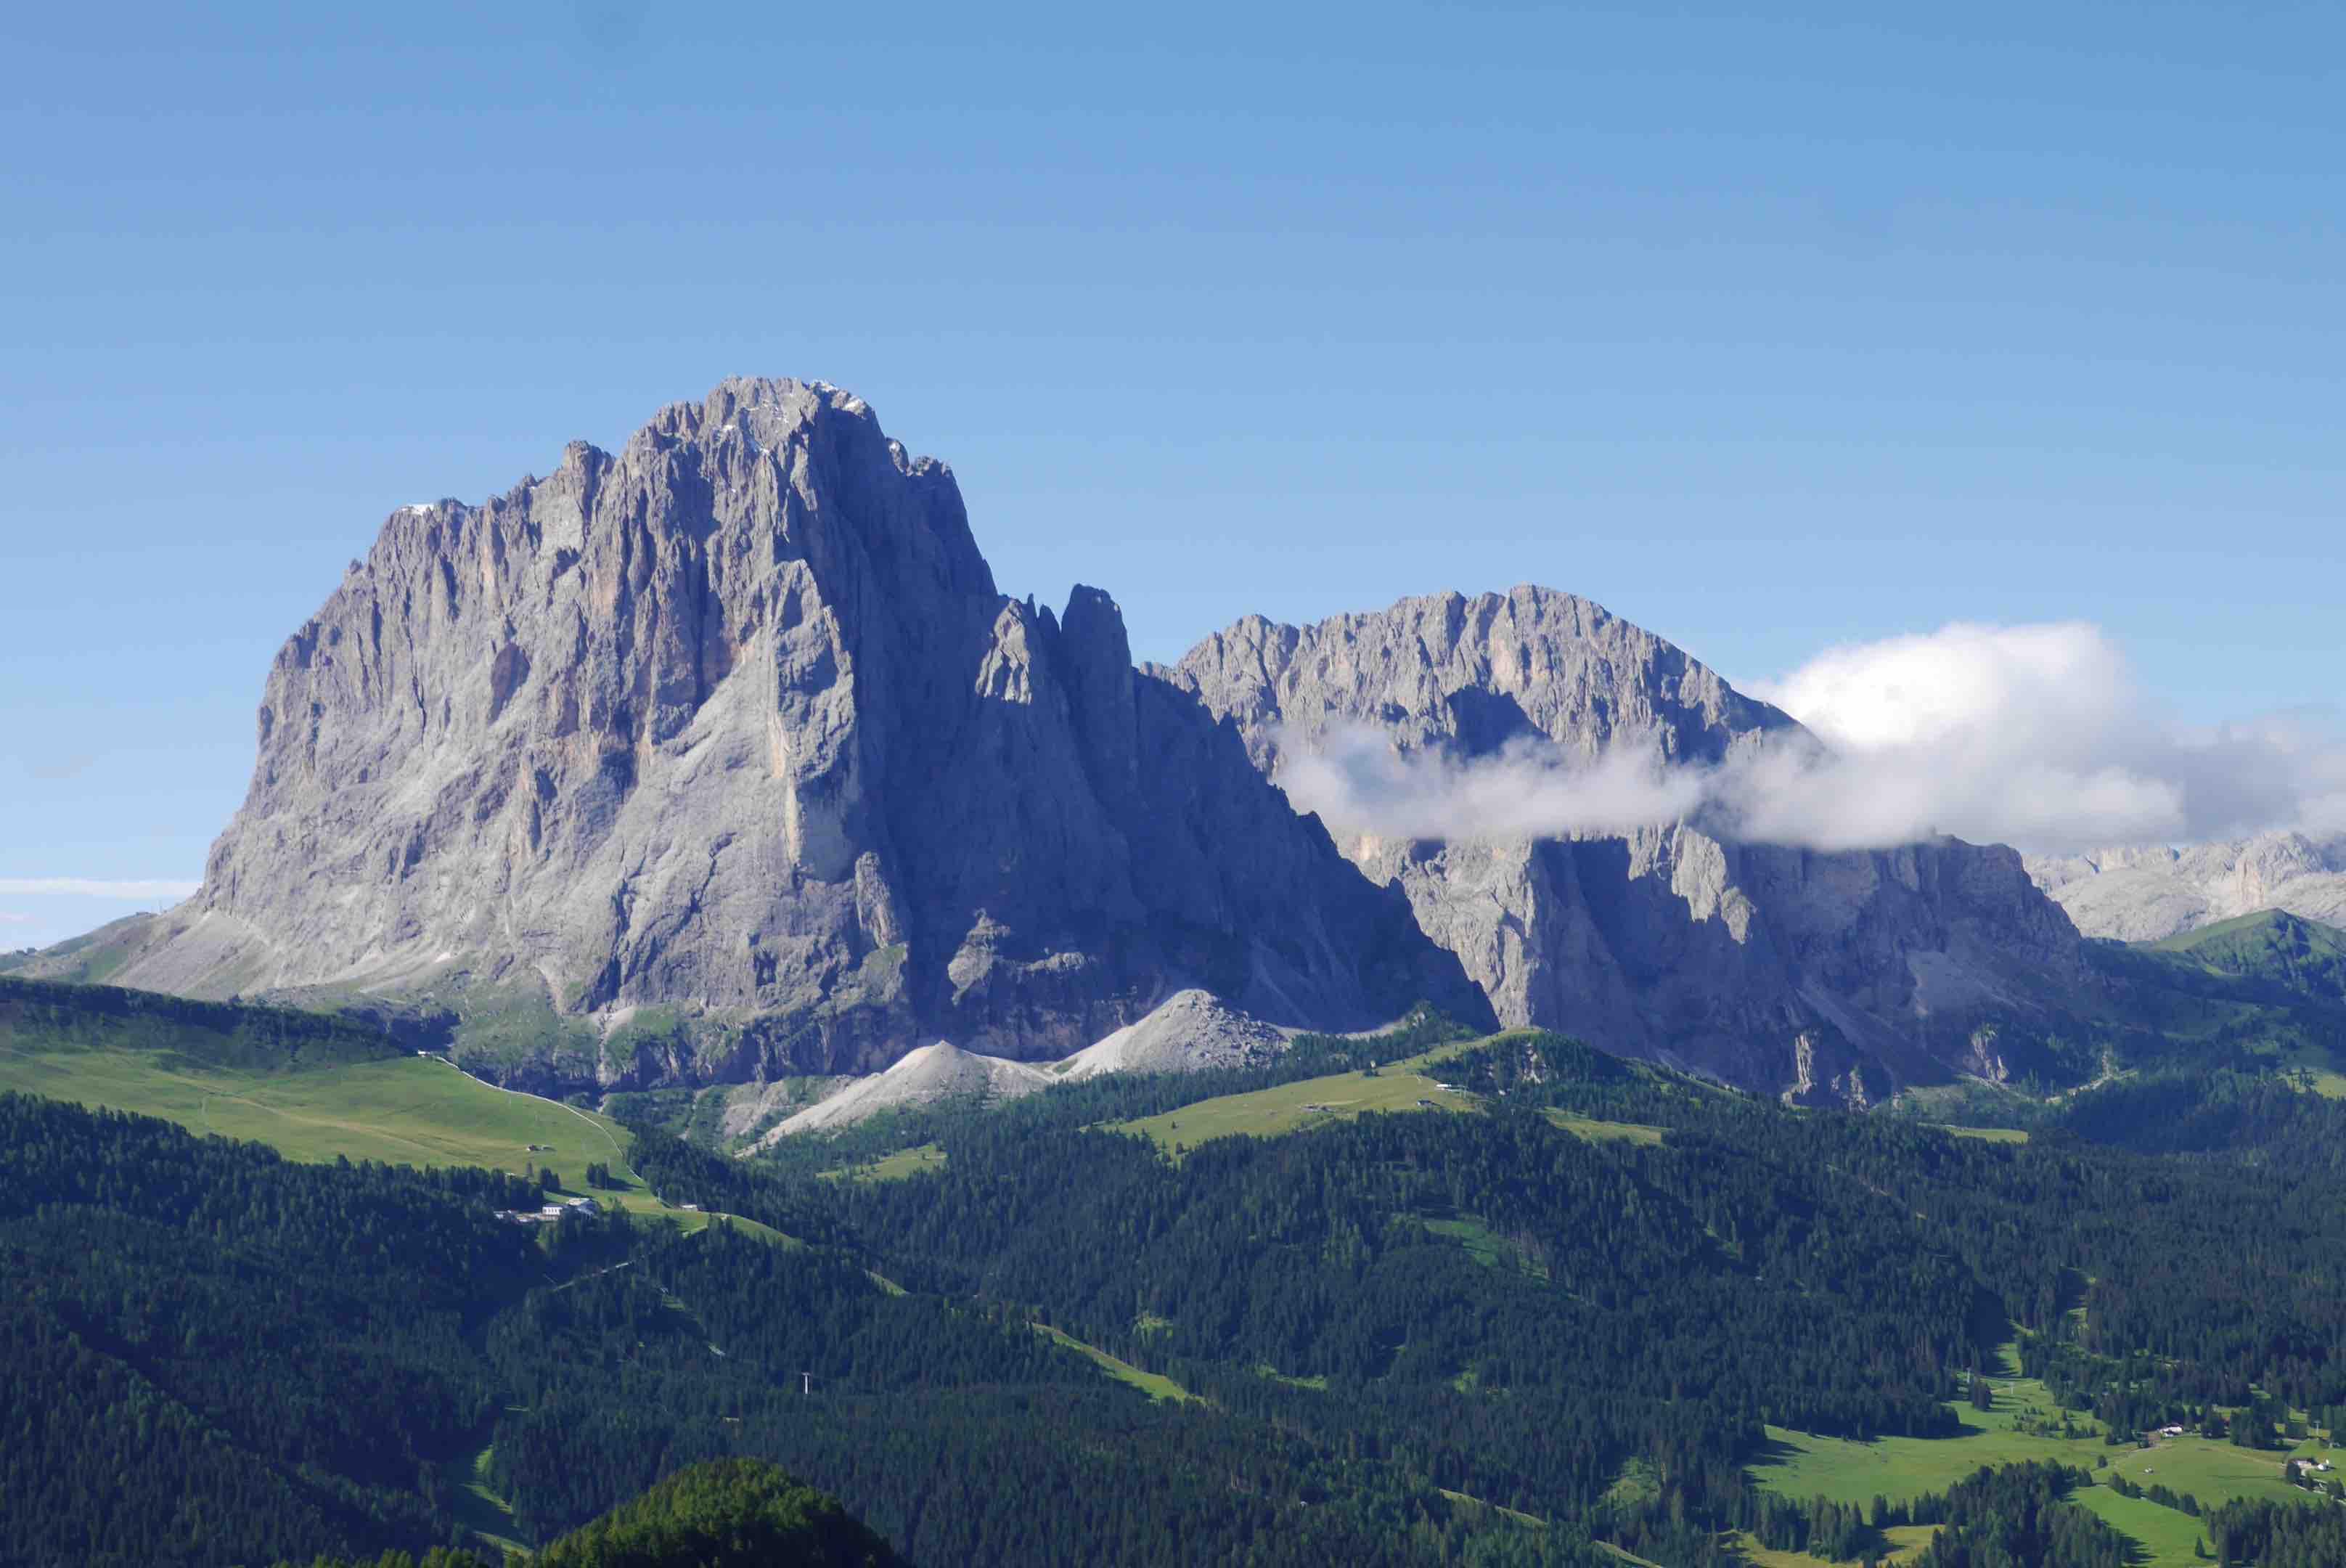 montagne-italie-ali-di-firenze-18